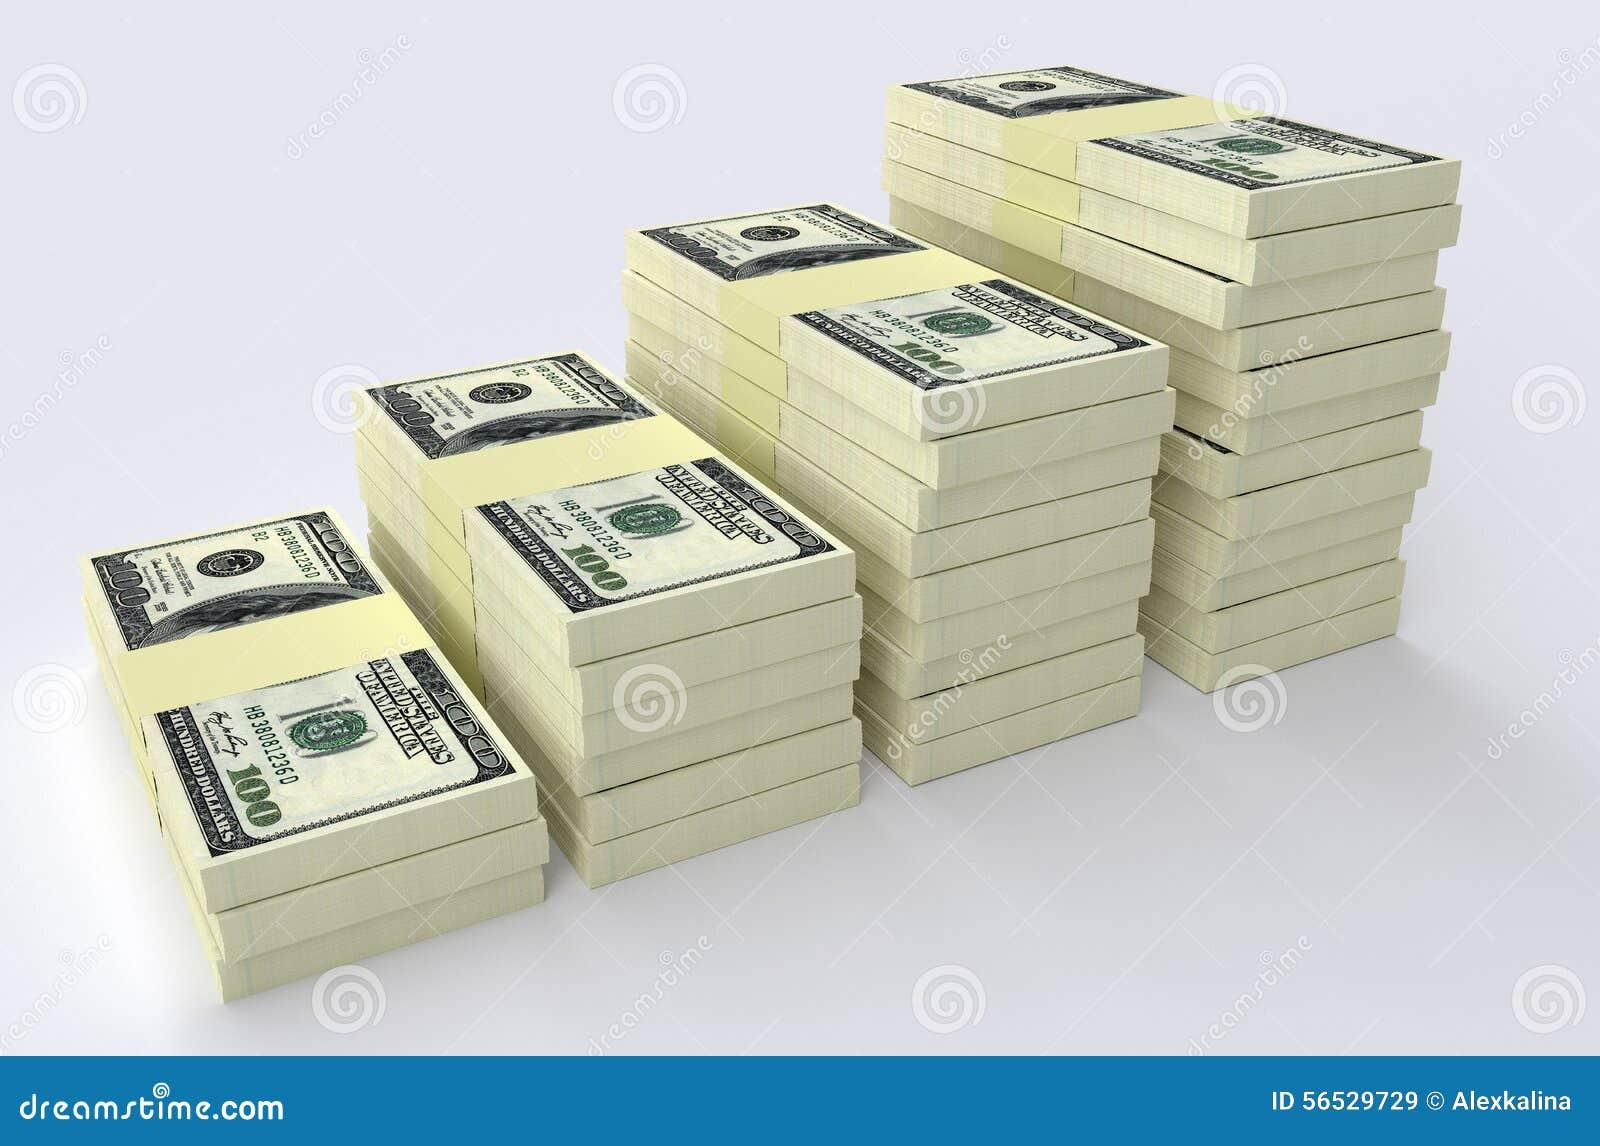 Big money stack. Finance concepts